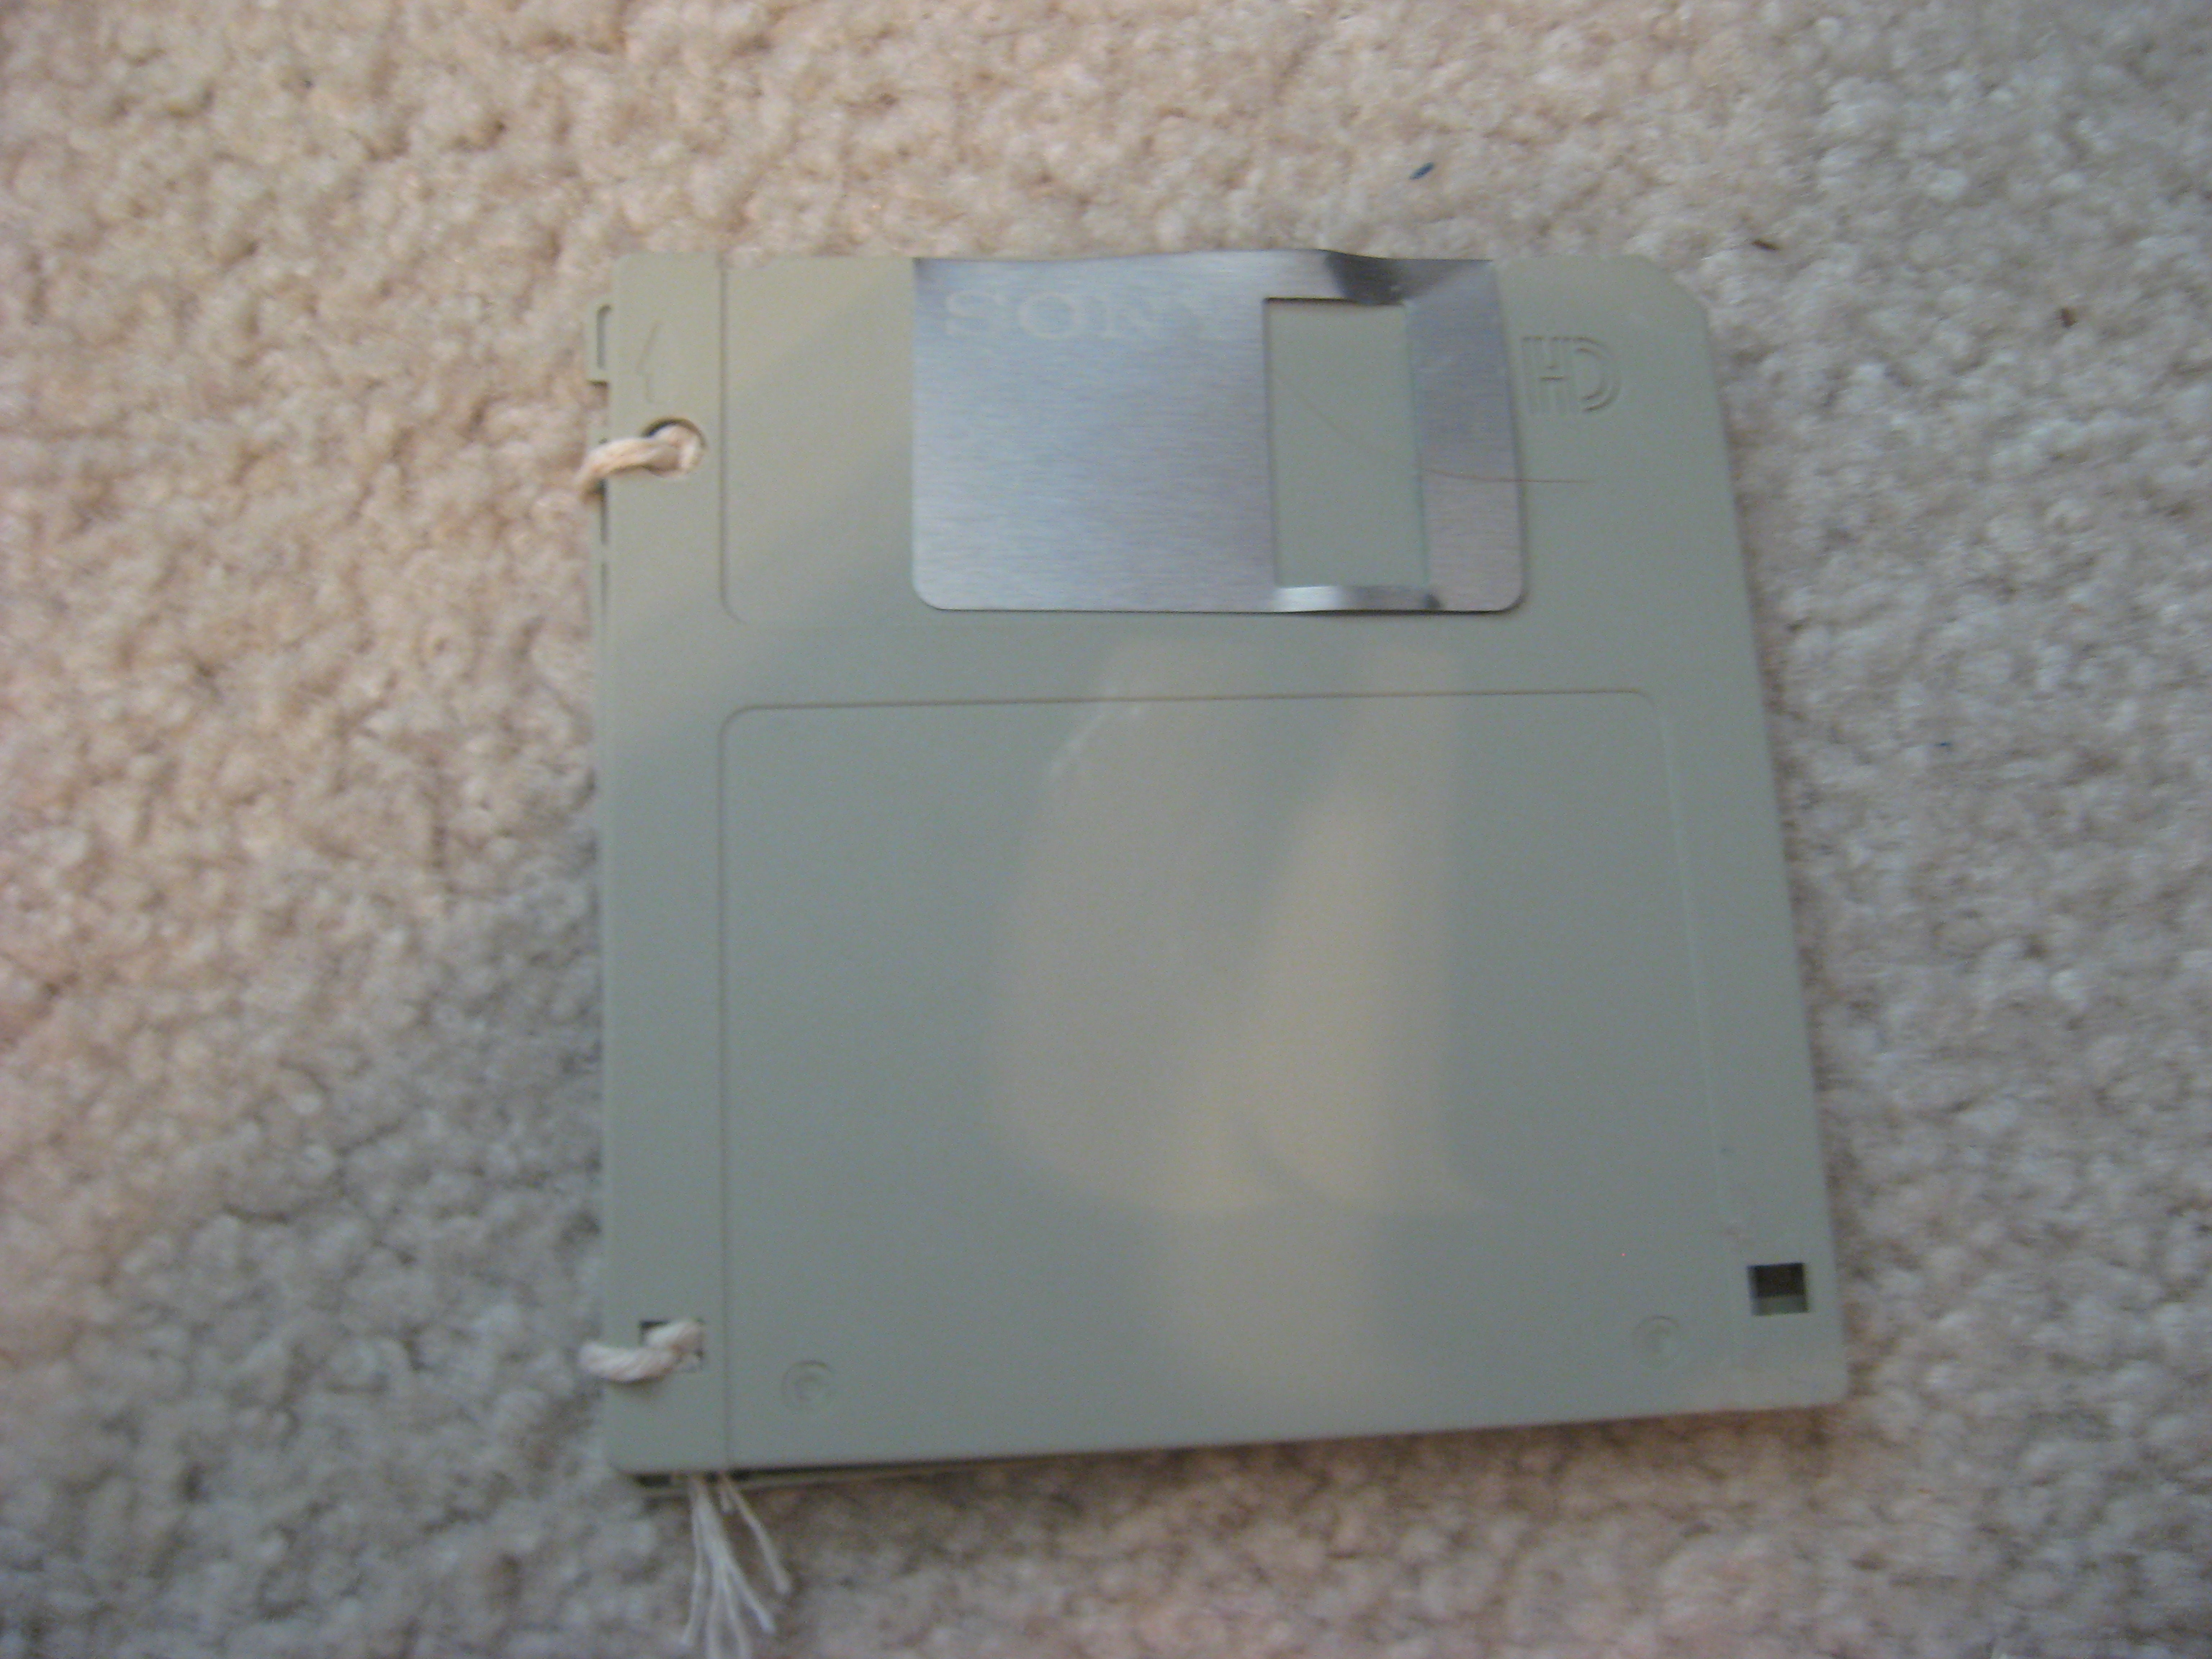 Floppy Disk Greeting Card